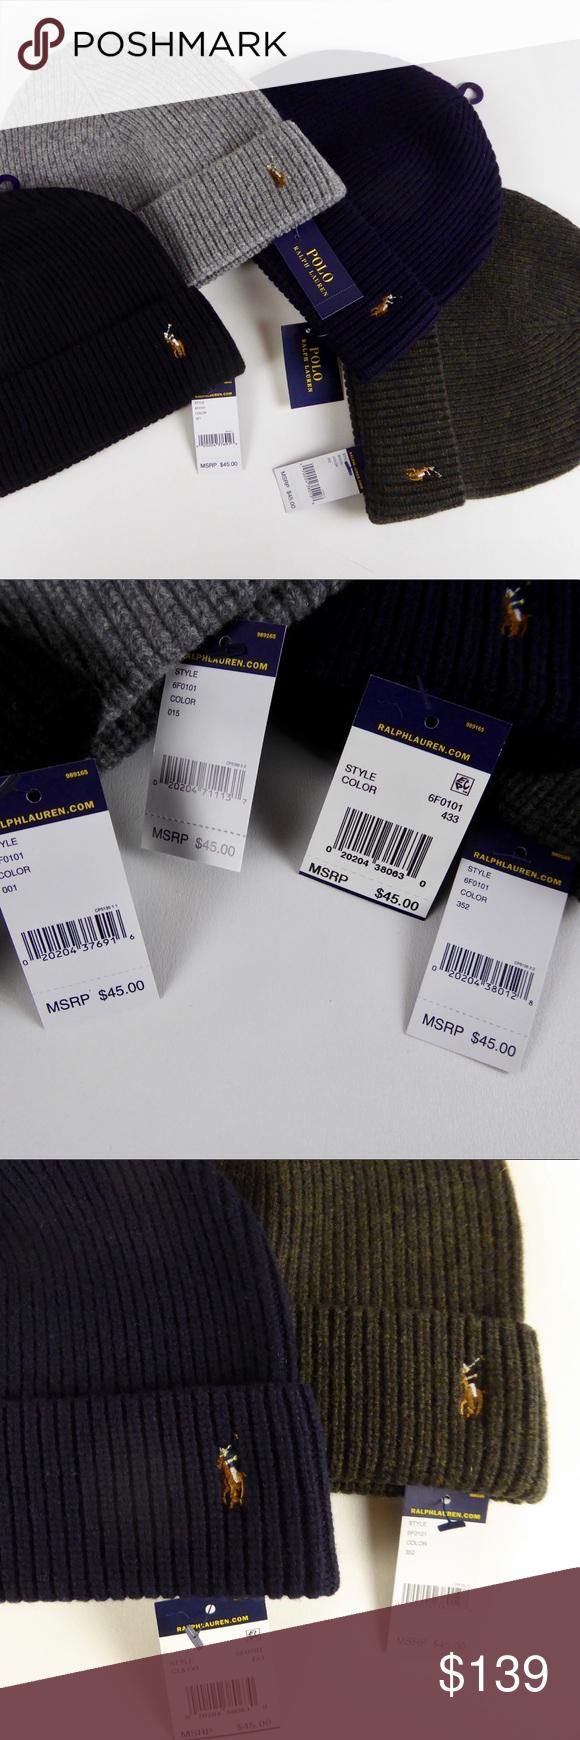 Polo Ralph Lauren Merino Wool Watch Cap Beanie Set Polo Ralph Lauren Hat  Bundle 🏇🏽 c4239ae02e46